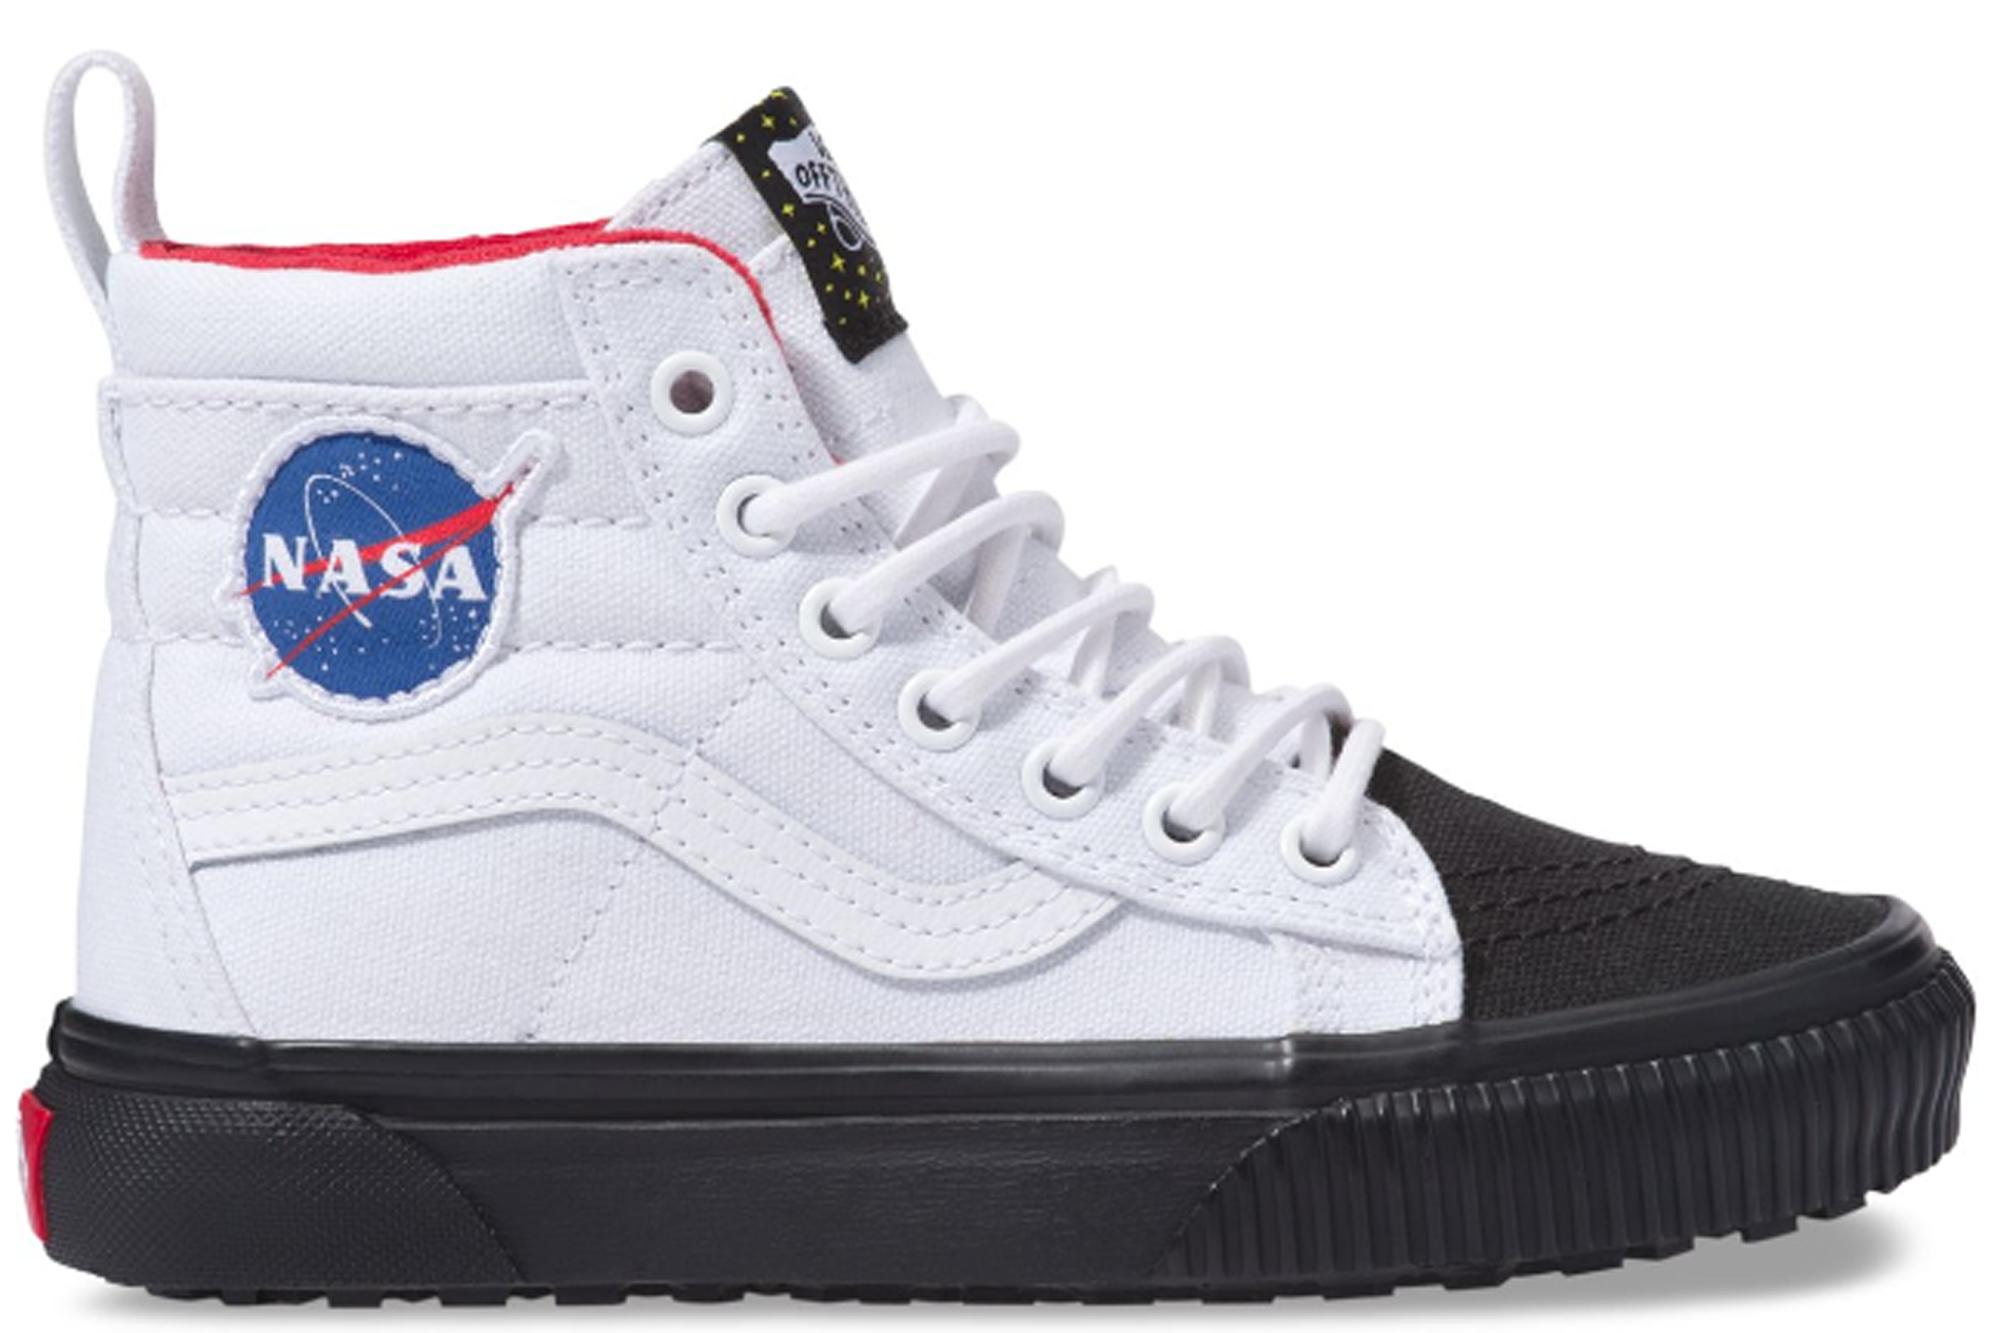 Vans Sk8-Hi MTE NASA Space Voyager True